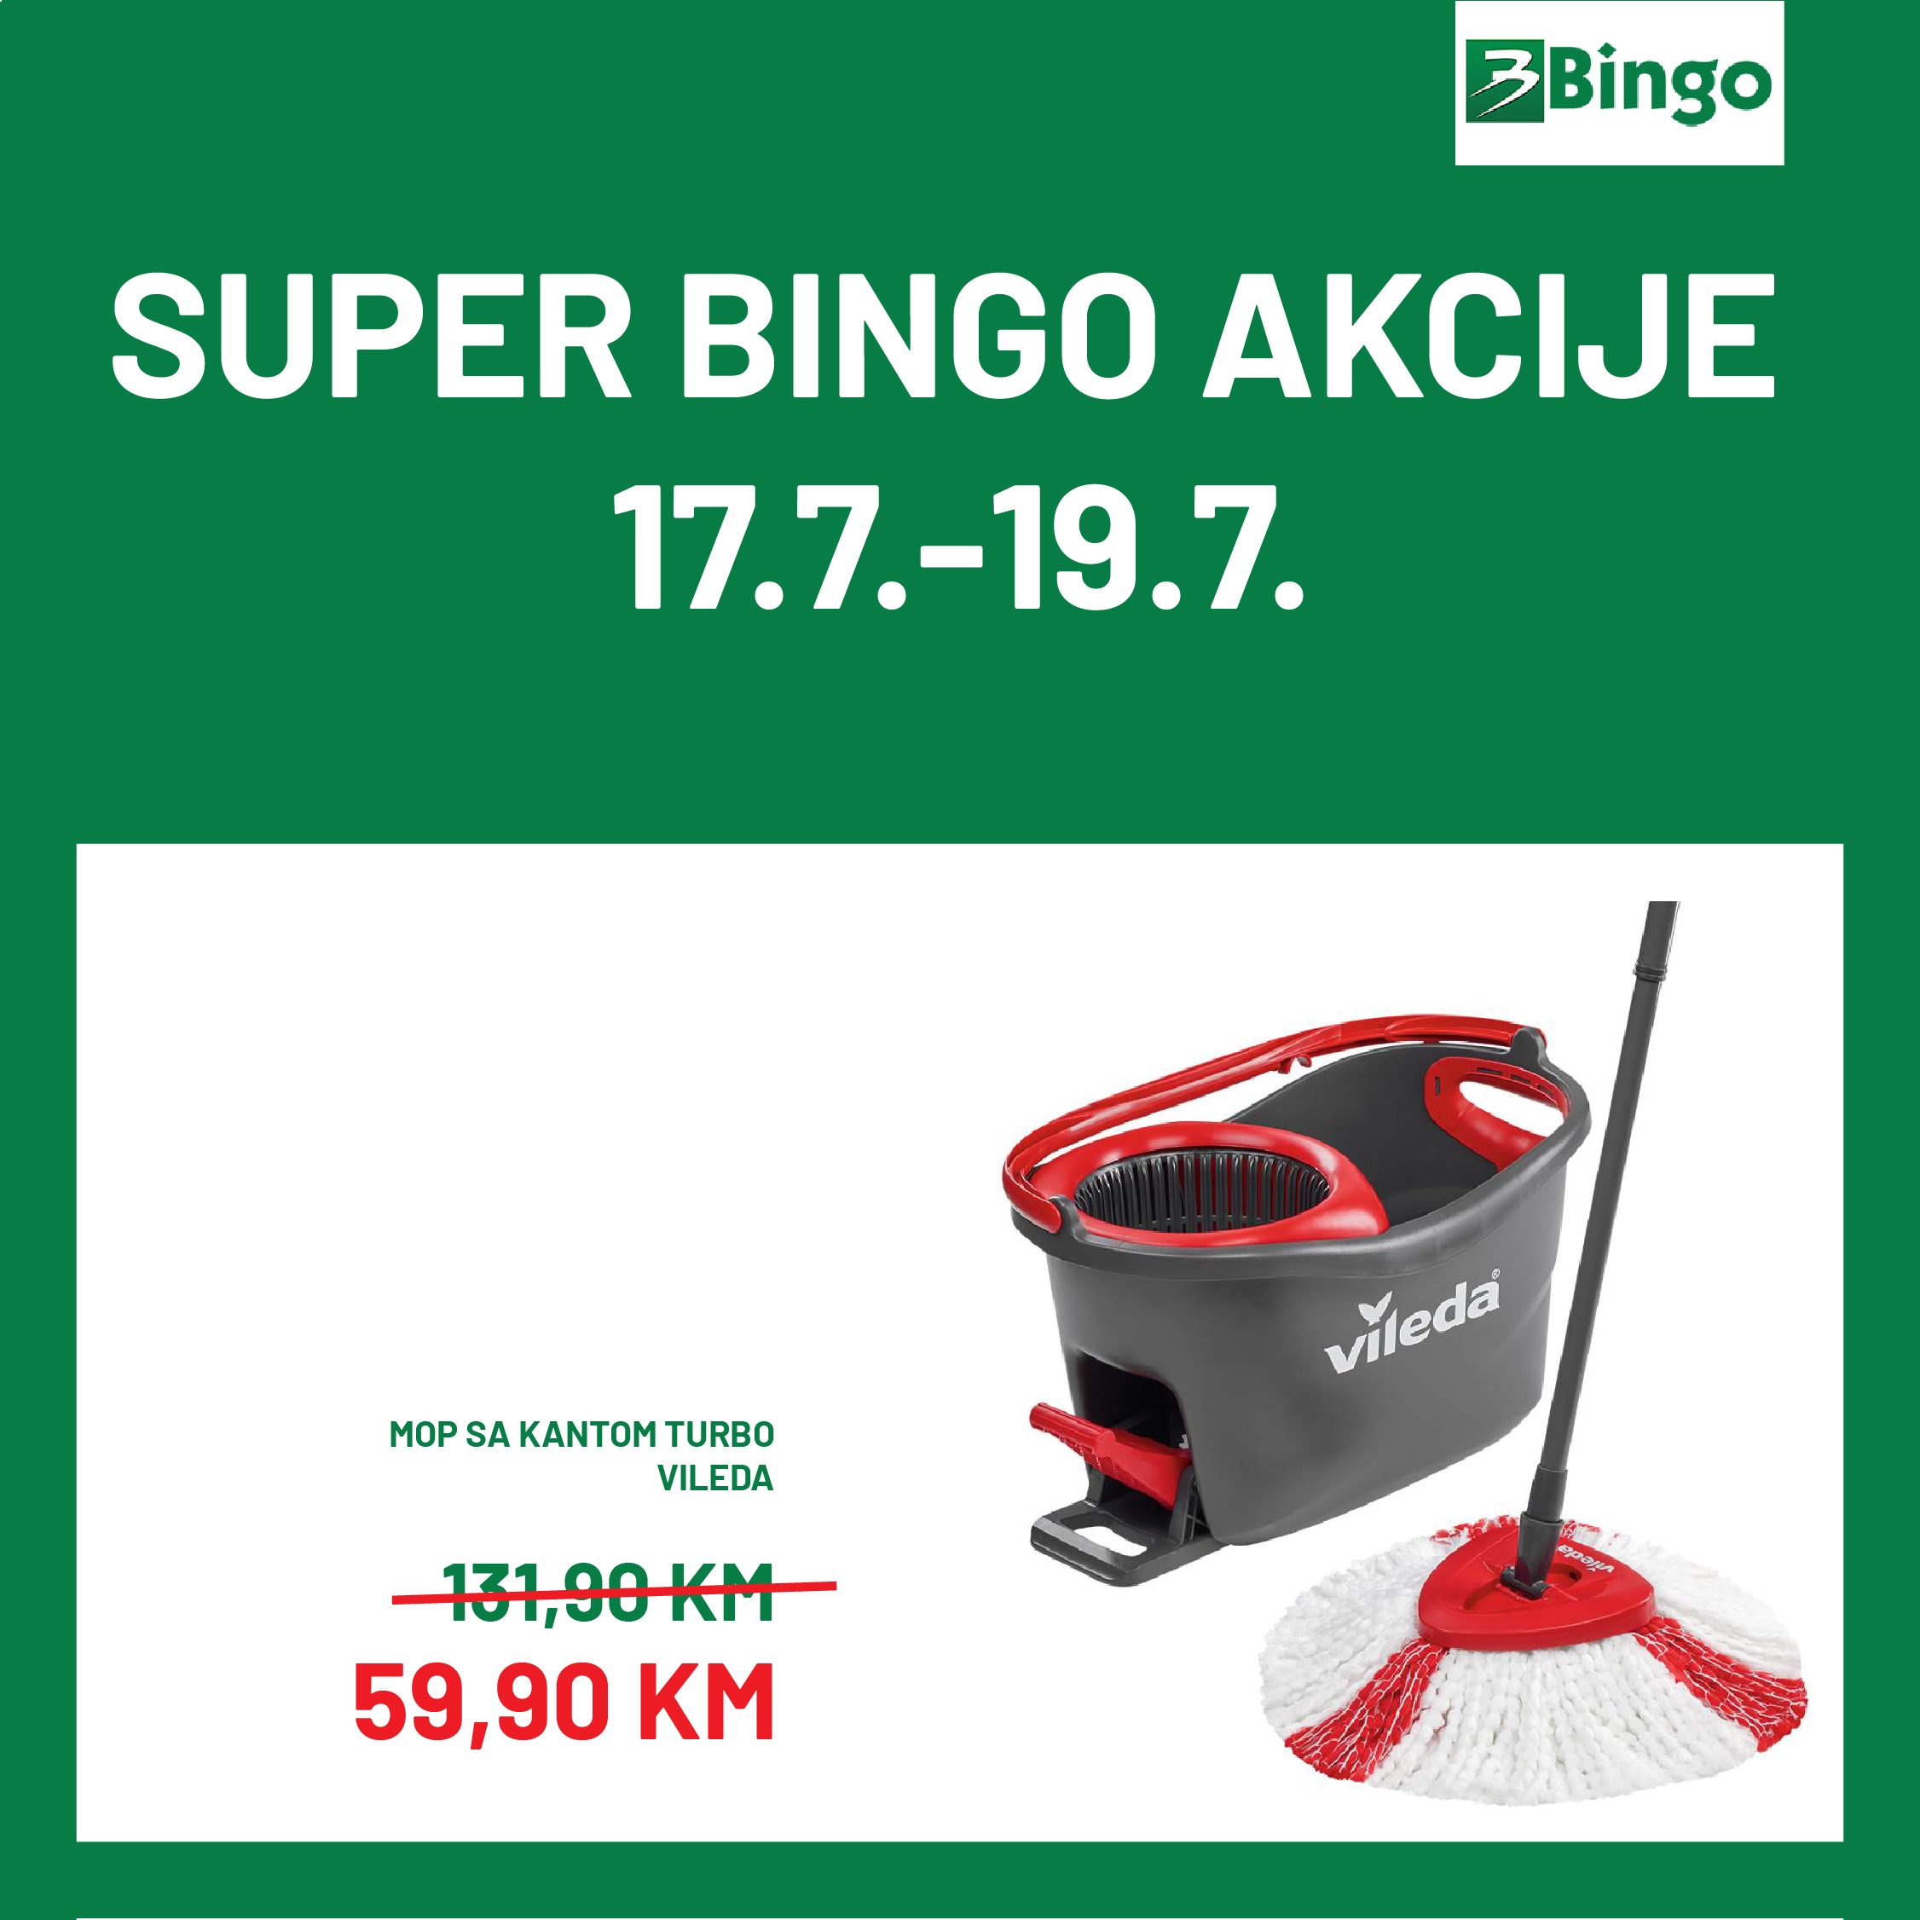 BINGO katalog Page 1